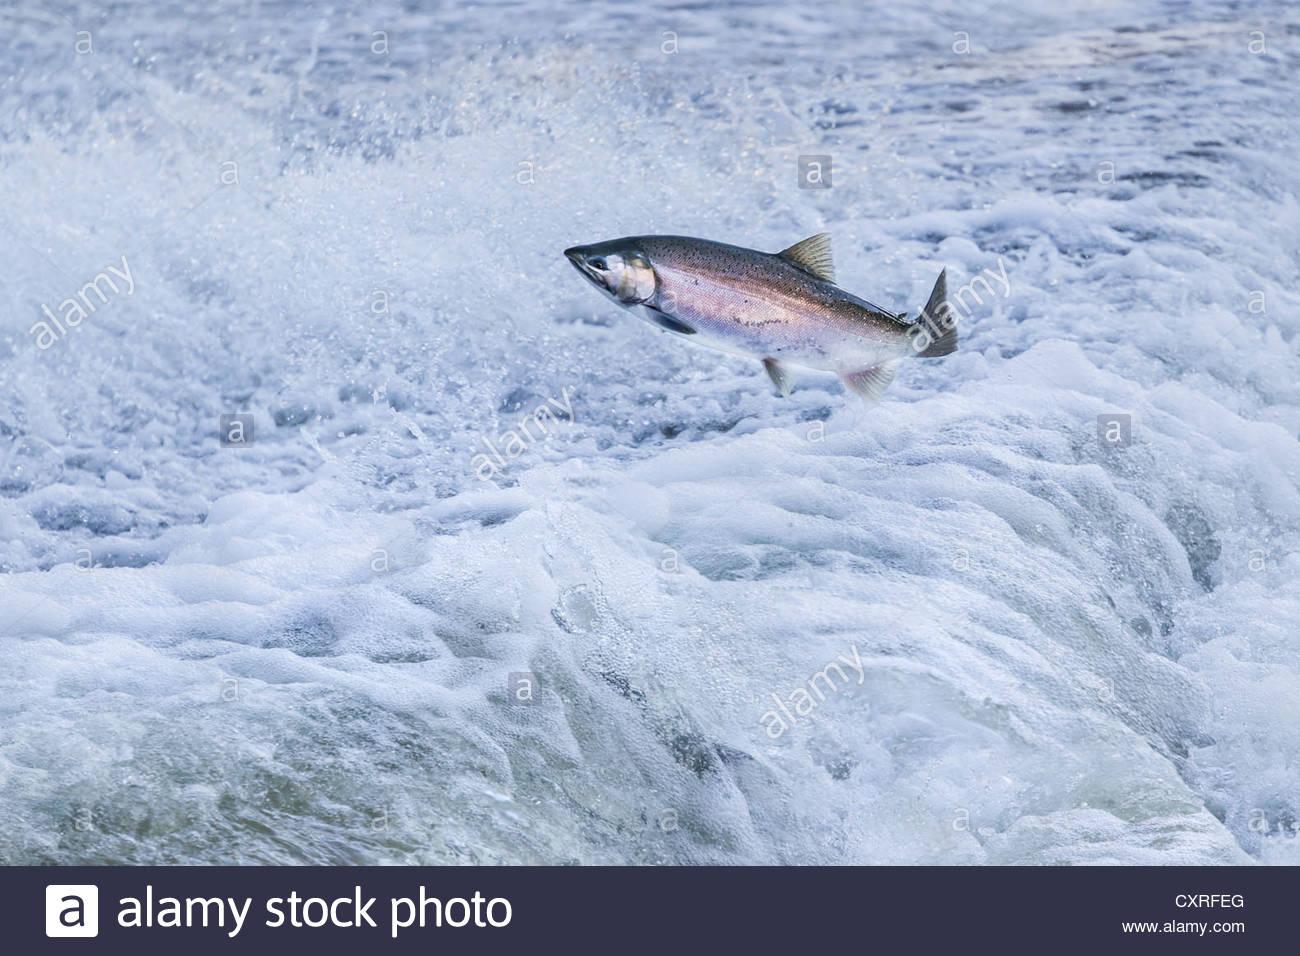 lake-ontario-chinook-salmon-attempting-l